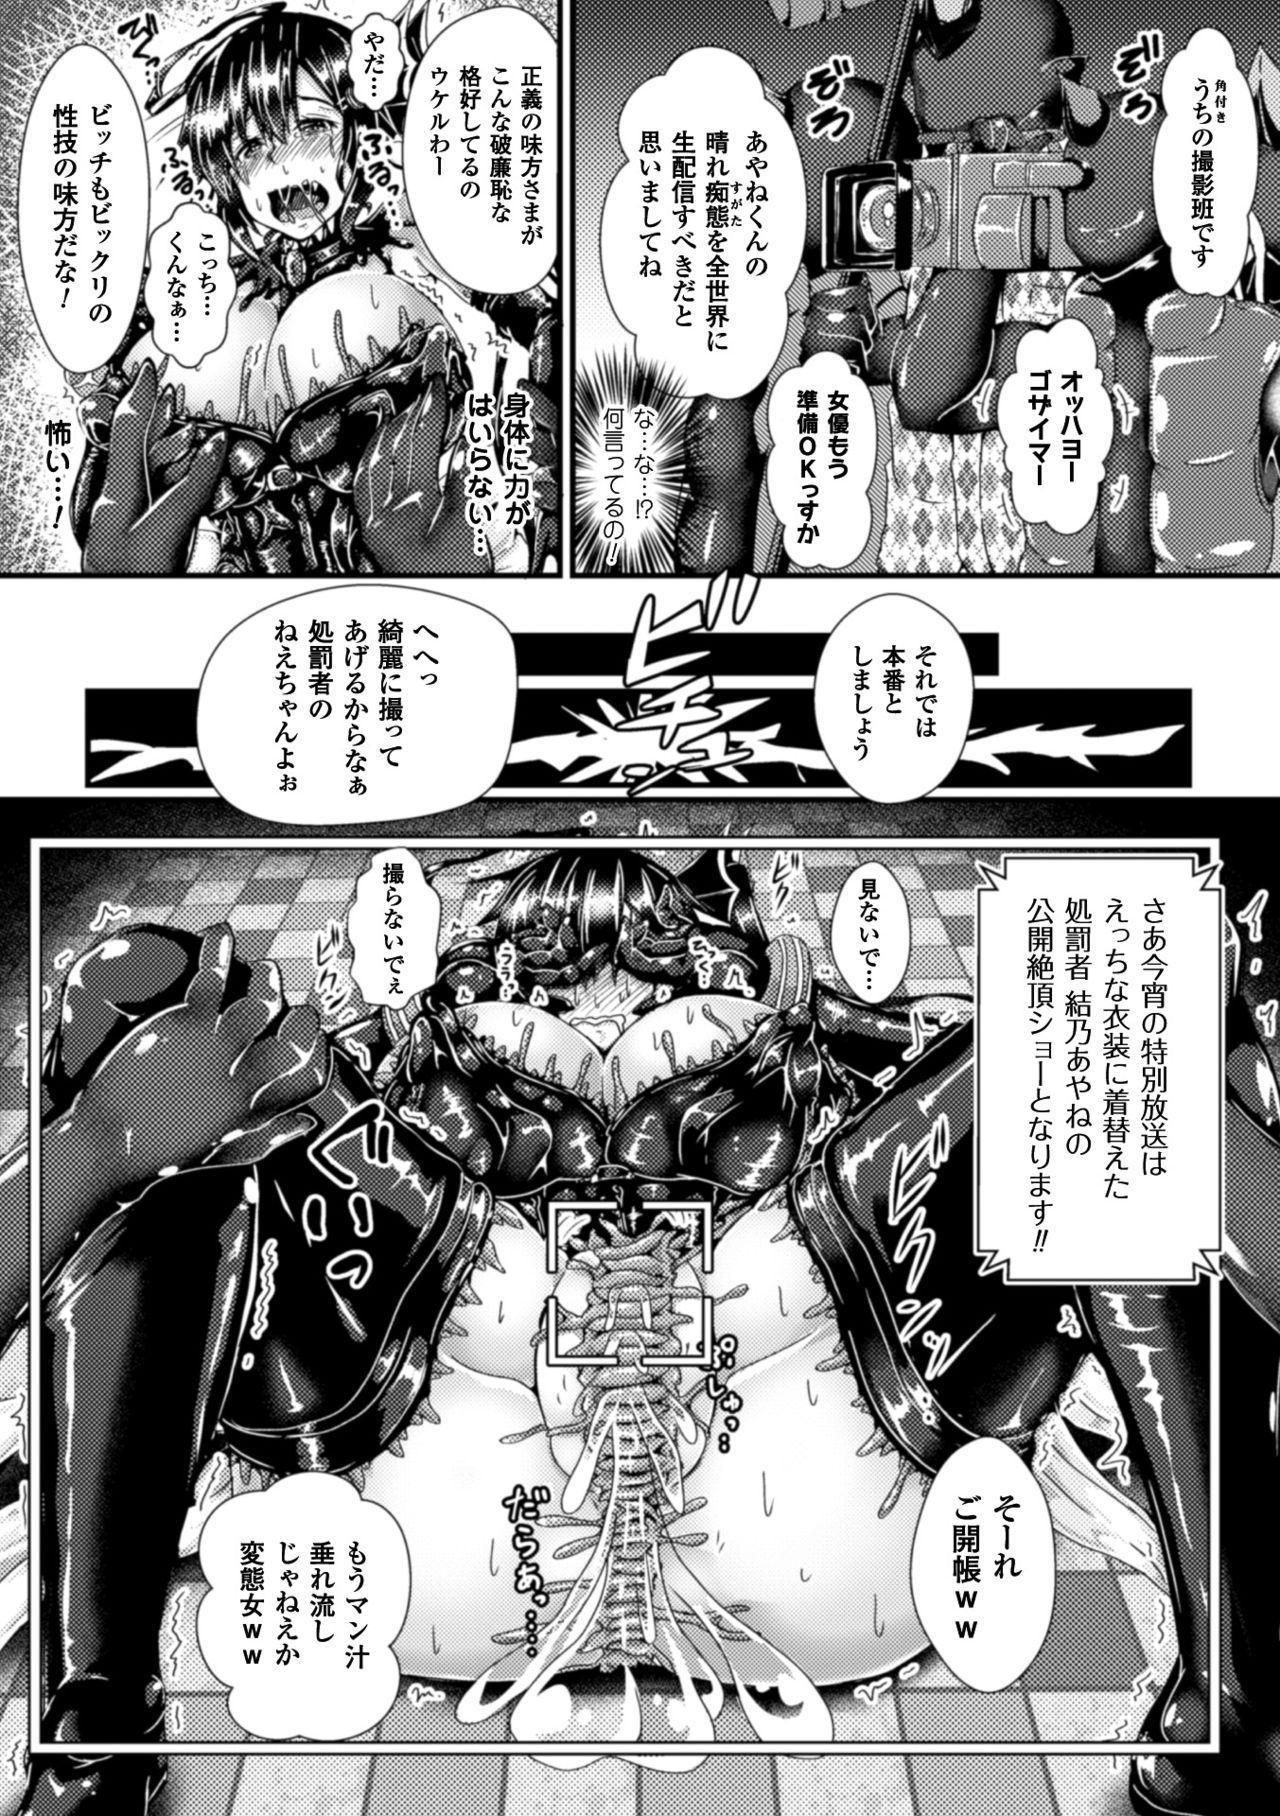 2D Comic Magazine Shokushu Yoroi ni Zenshin o Okasare Mugen Zecchou! Vol. 5 50